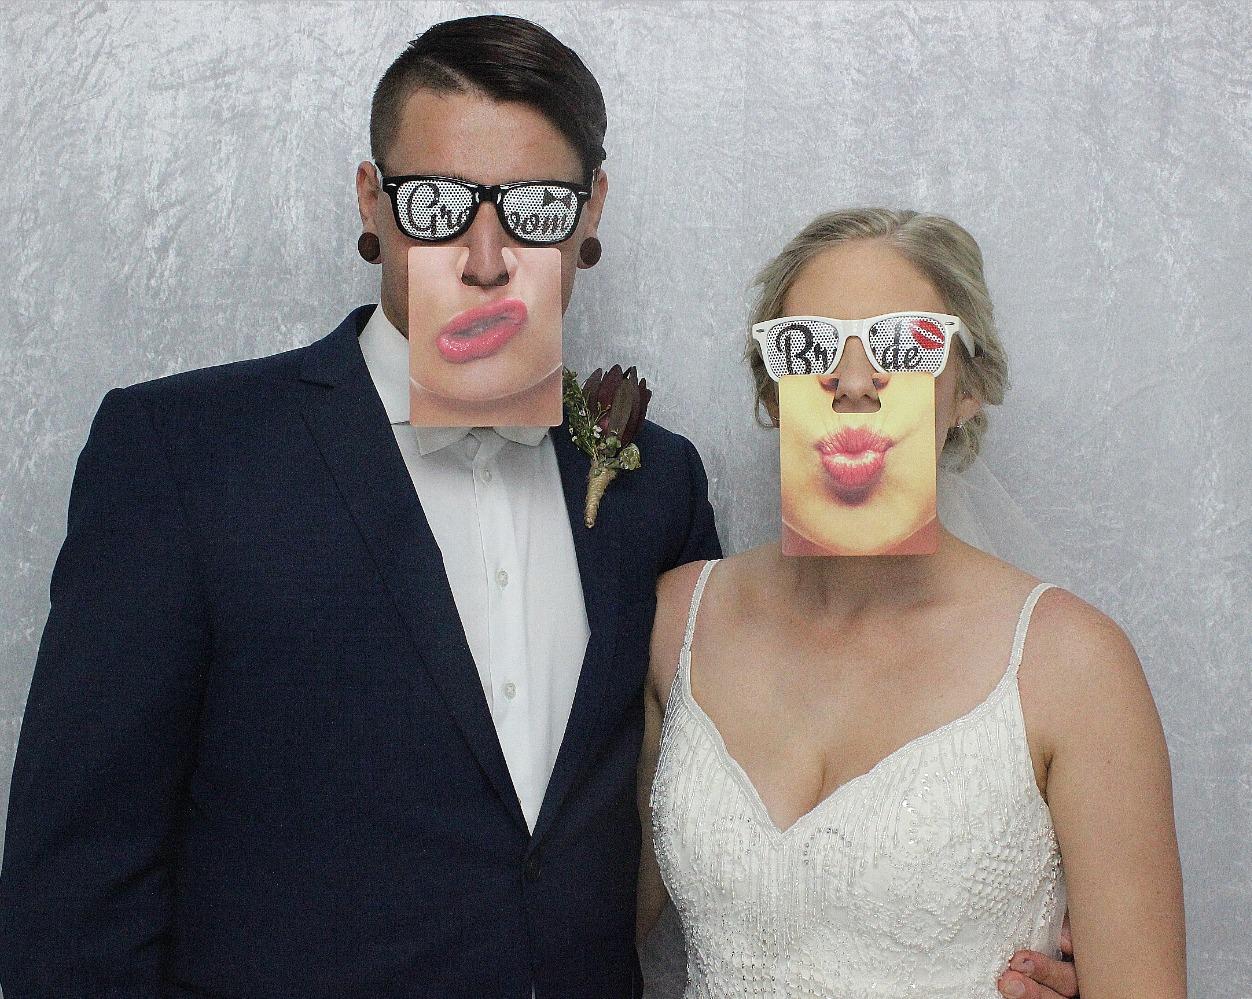 Face mask fun!